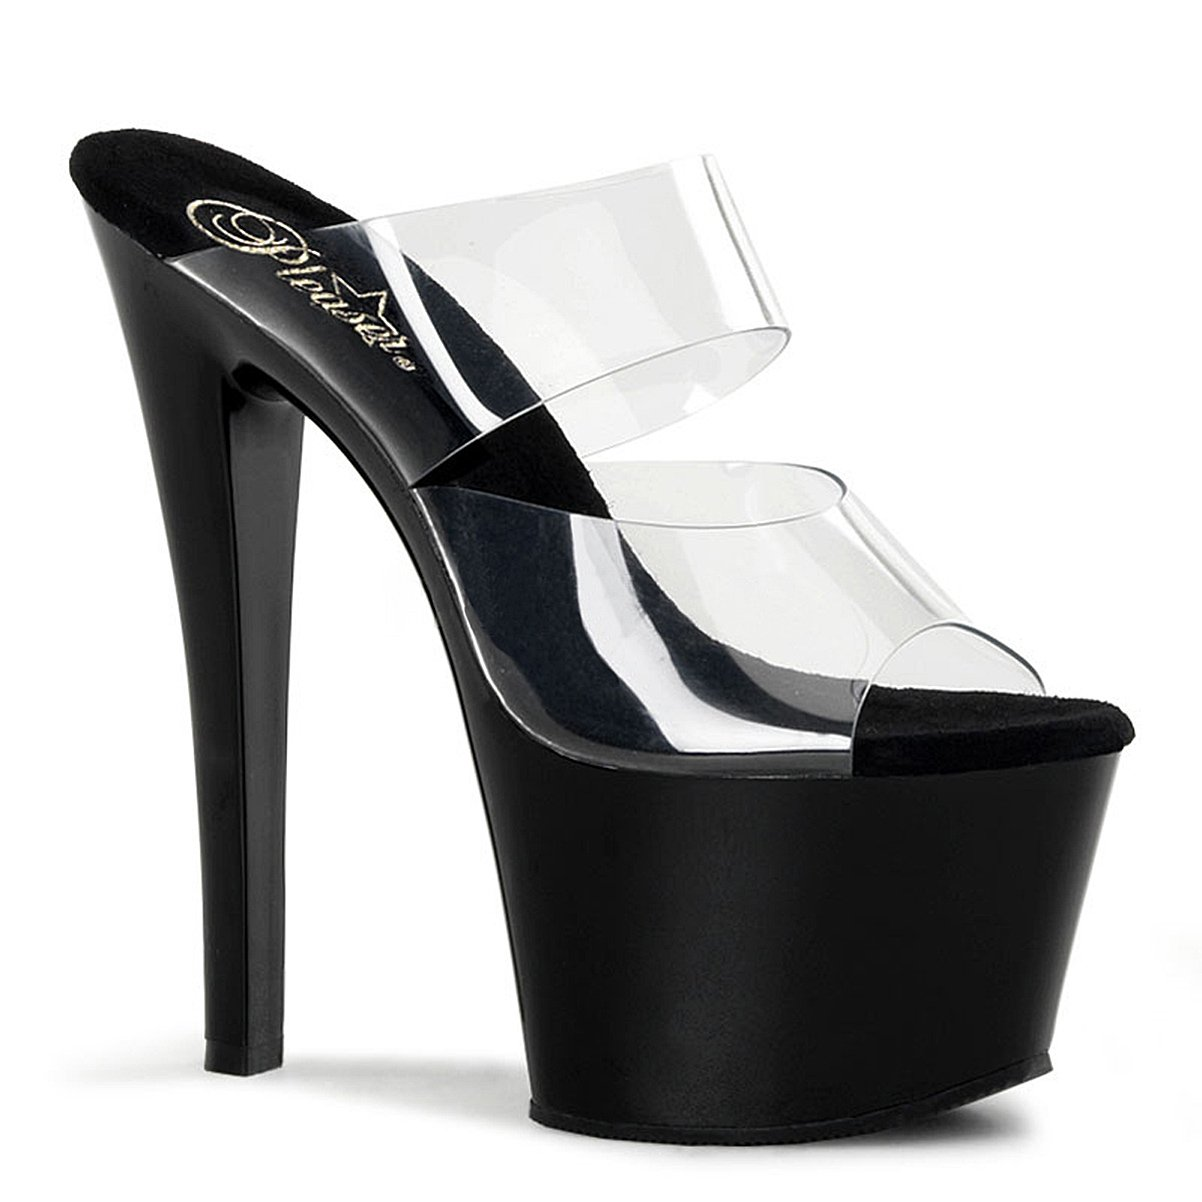 943a80044d3 Amazon.com | Summitfashions 7 Inch Sexy High Heel Shoes Womens ...